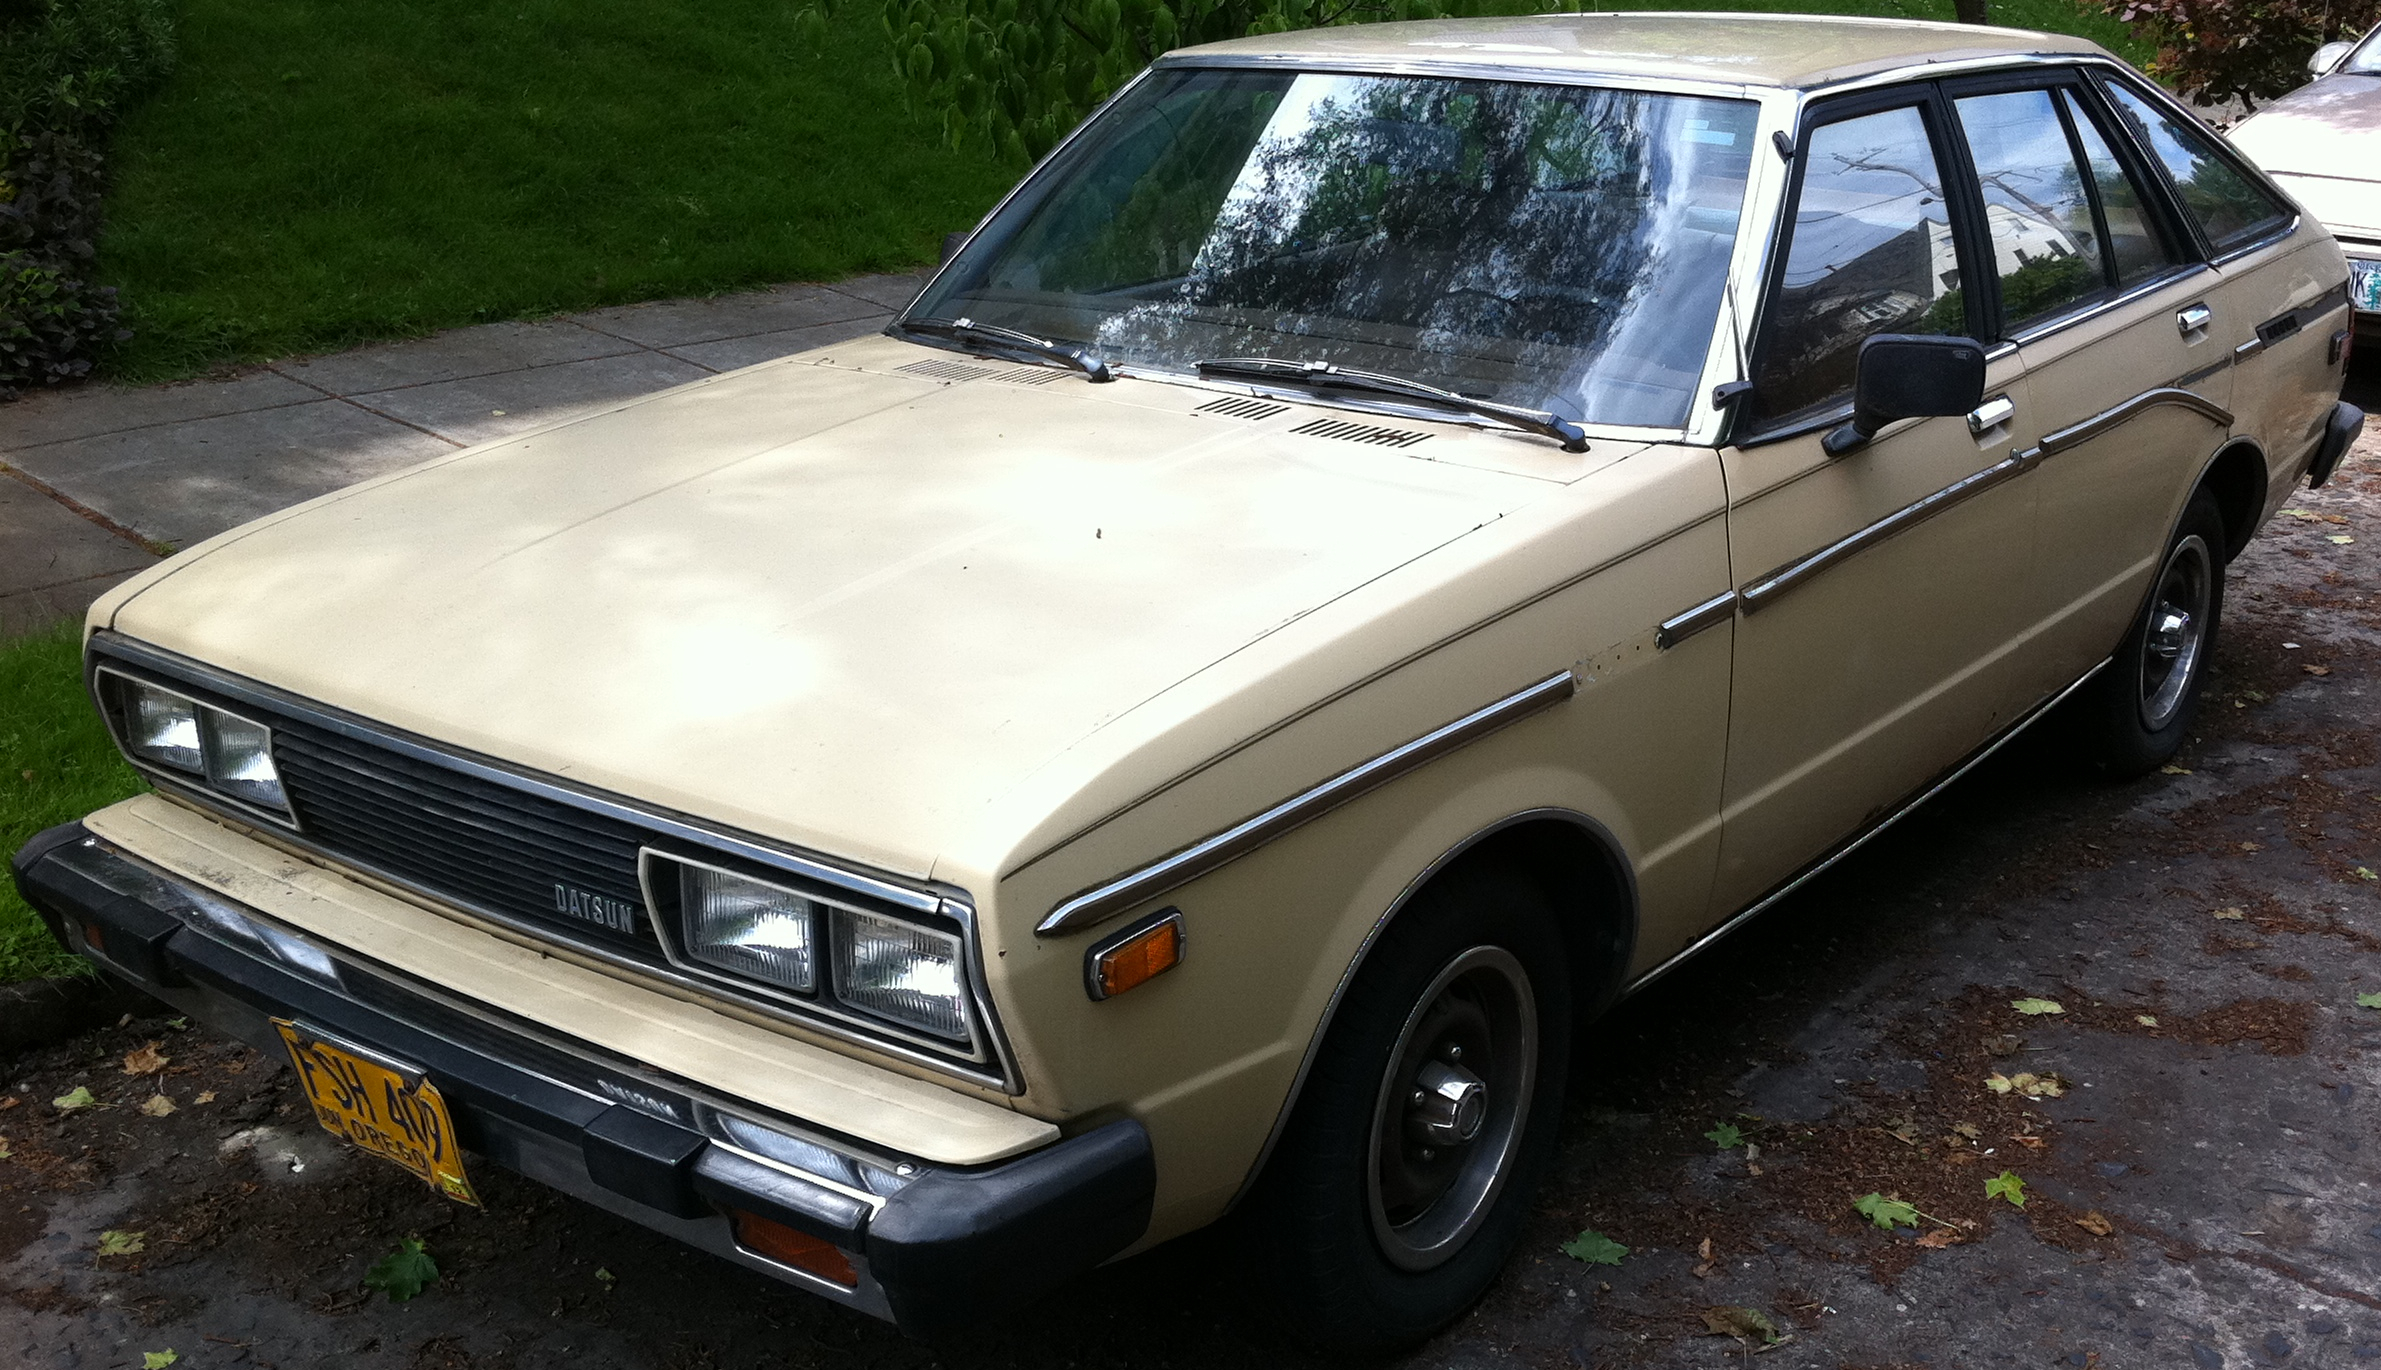 1980 Datsun 510 Hatchback